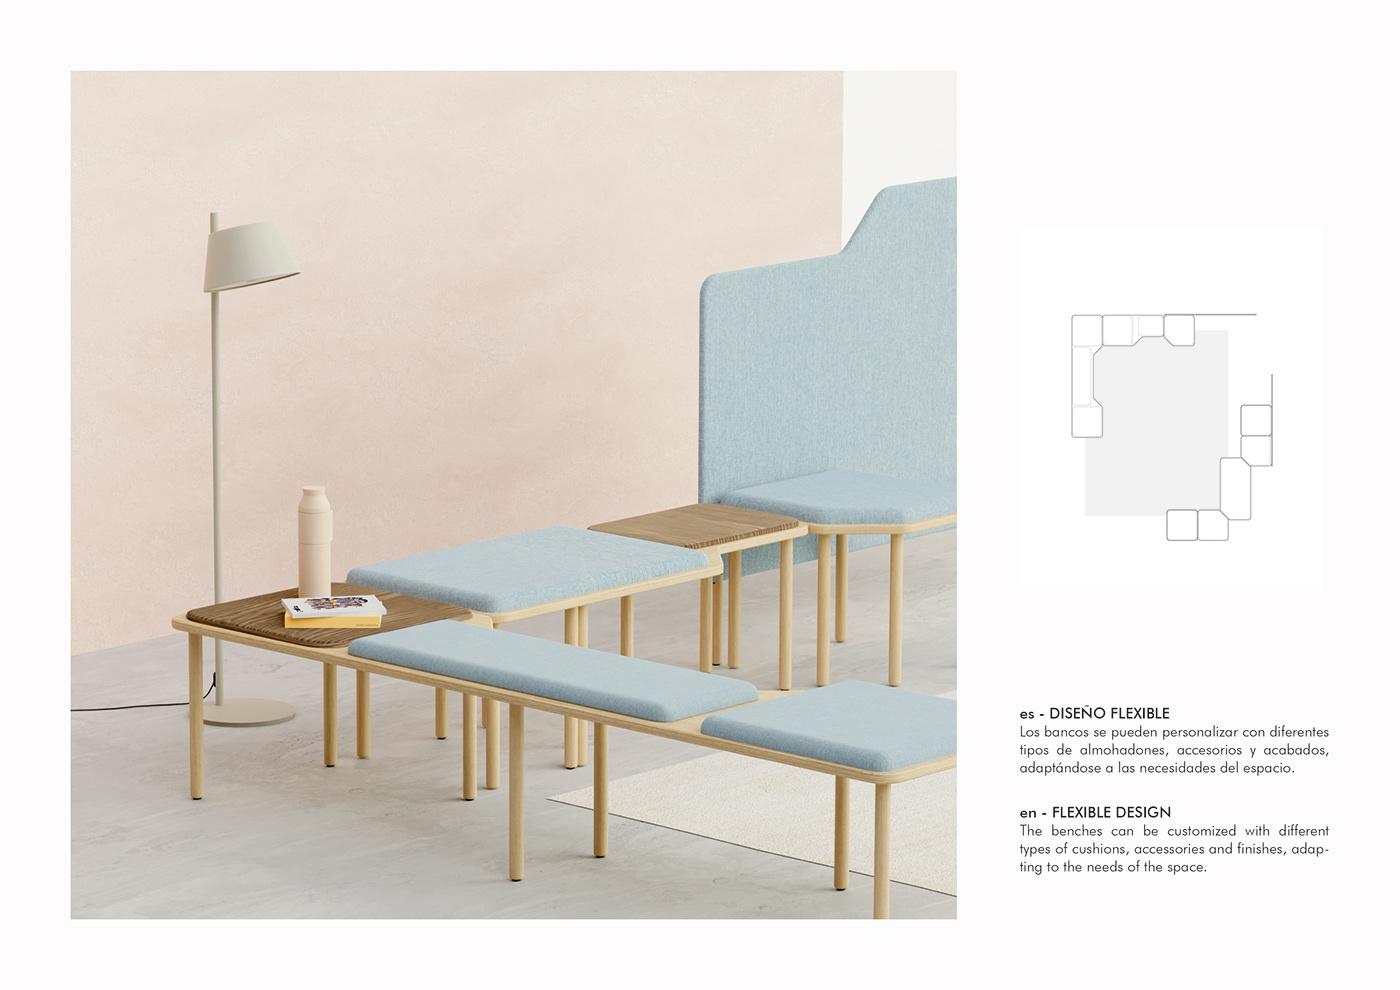 blender contract diseño de producto inclass mediterraneo modular sistem product design  producto Render mobiliario